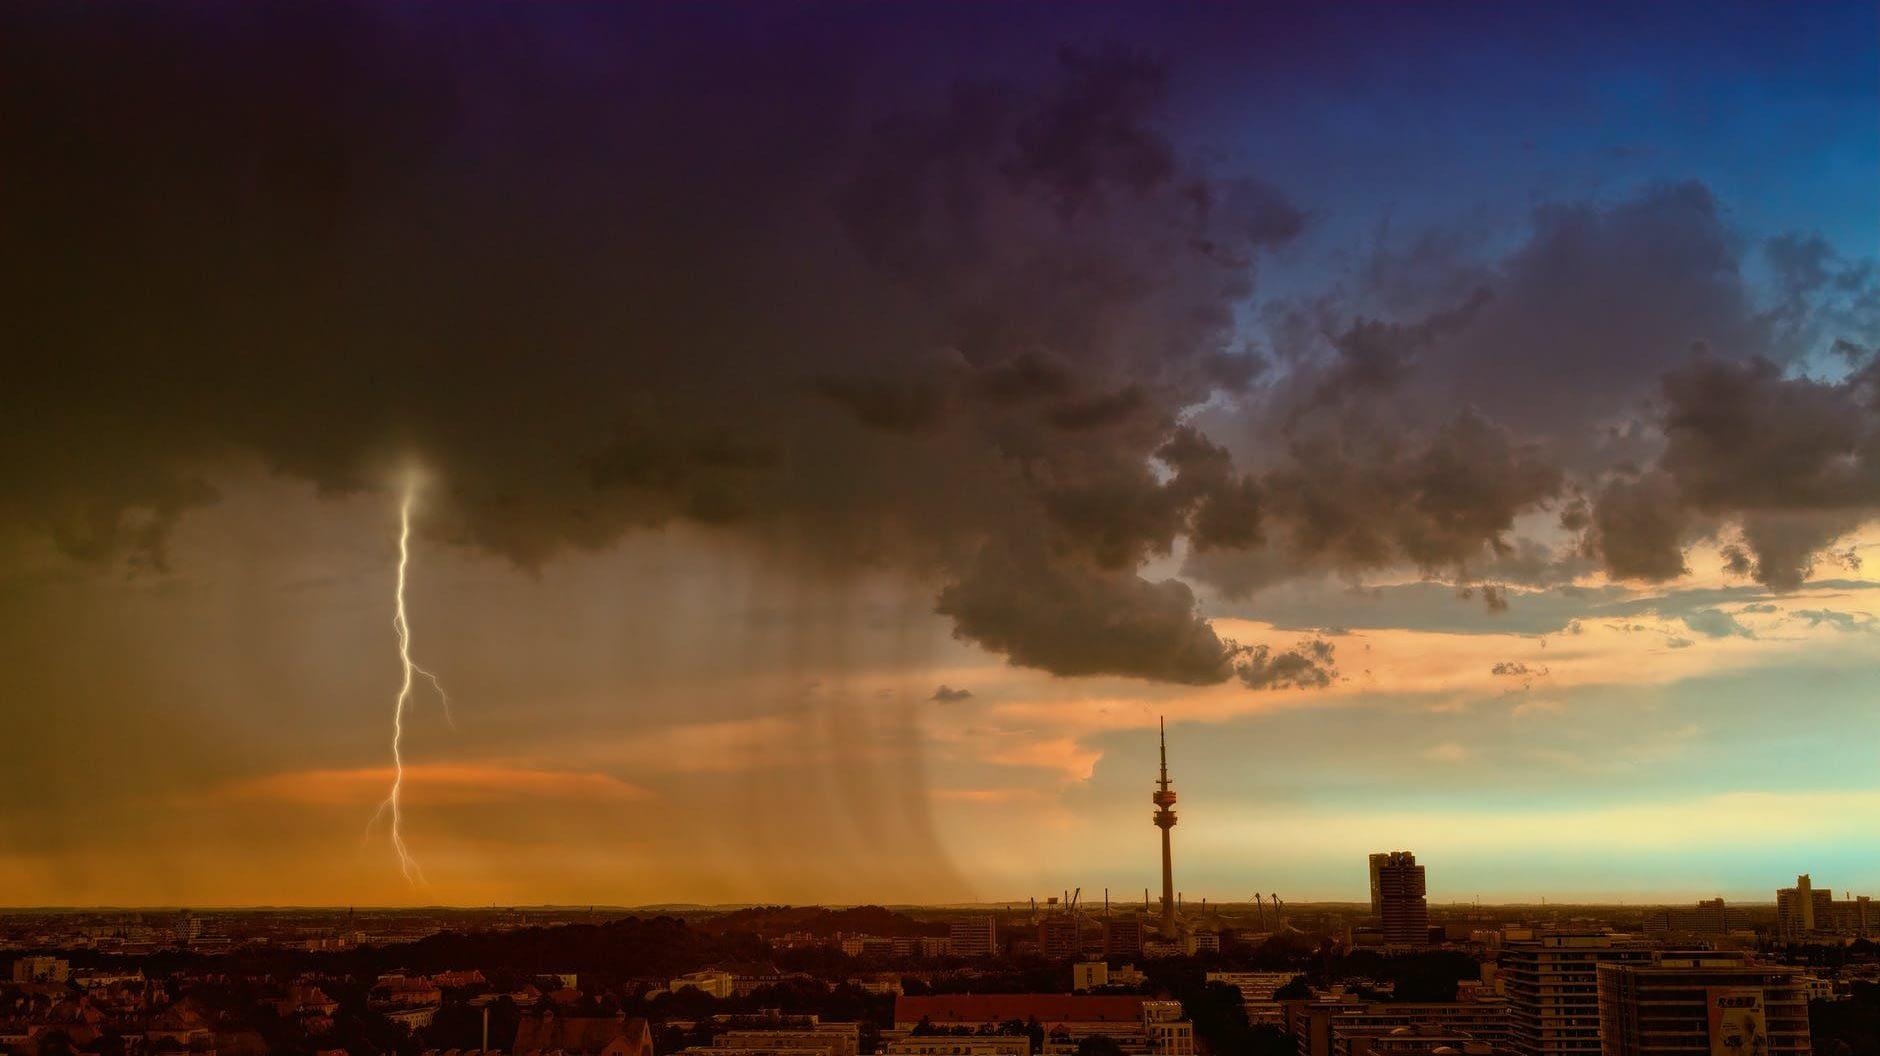 thunderstorms in arizona